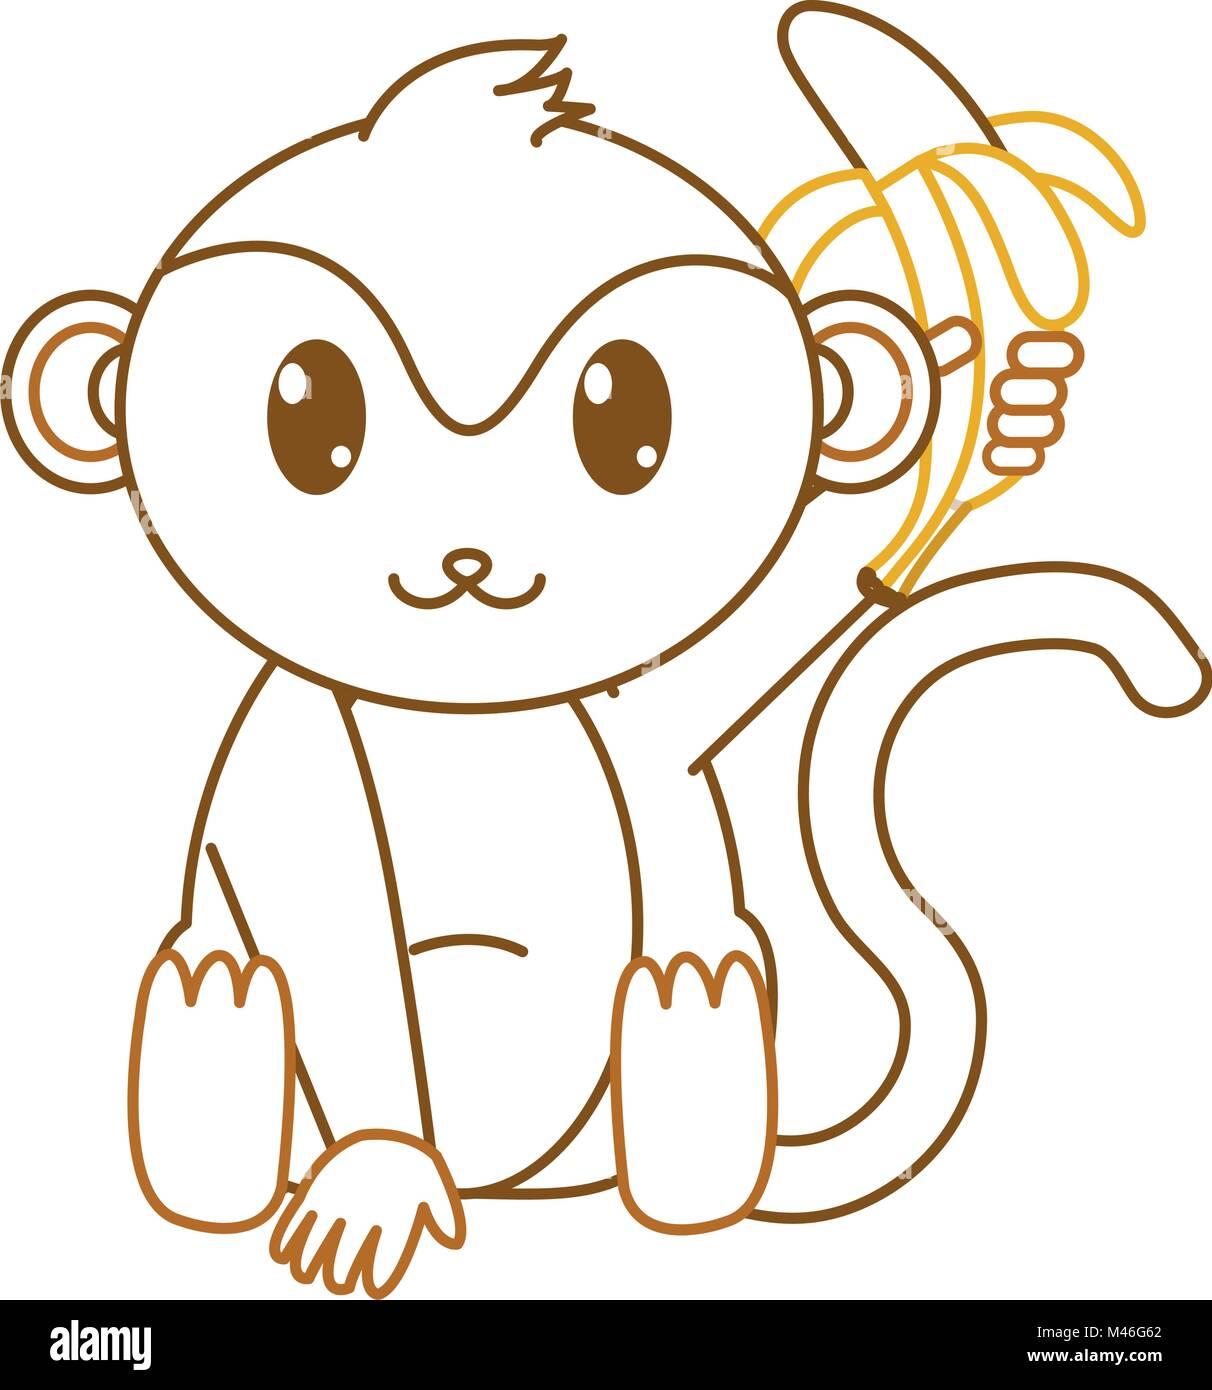 Großartig Affe Gesichtsmaske Vorlage Ideen - Entry Level Resume ...